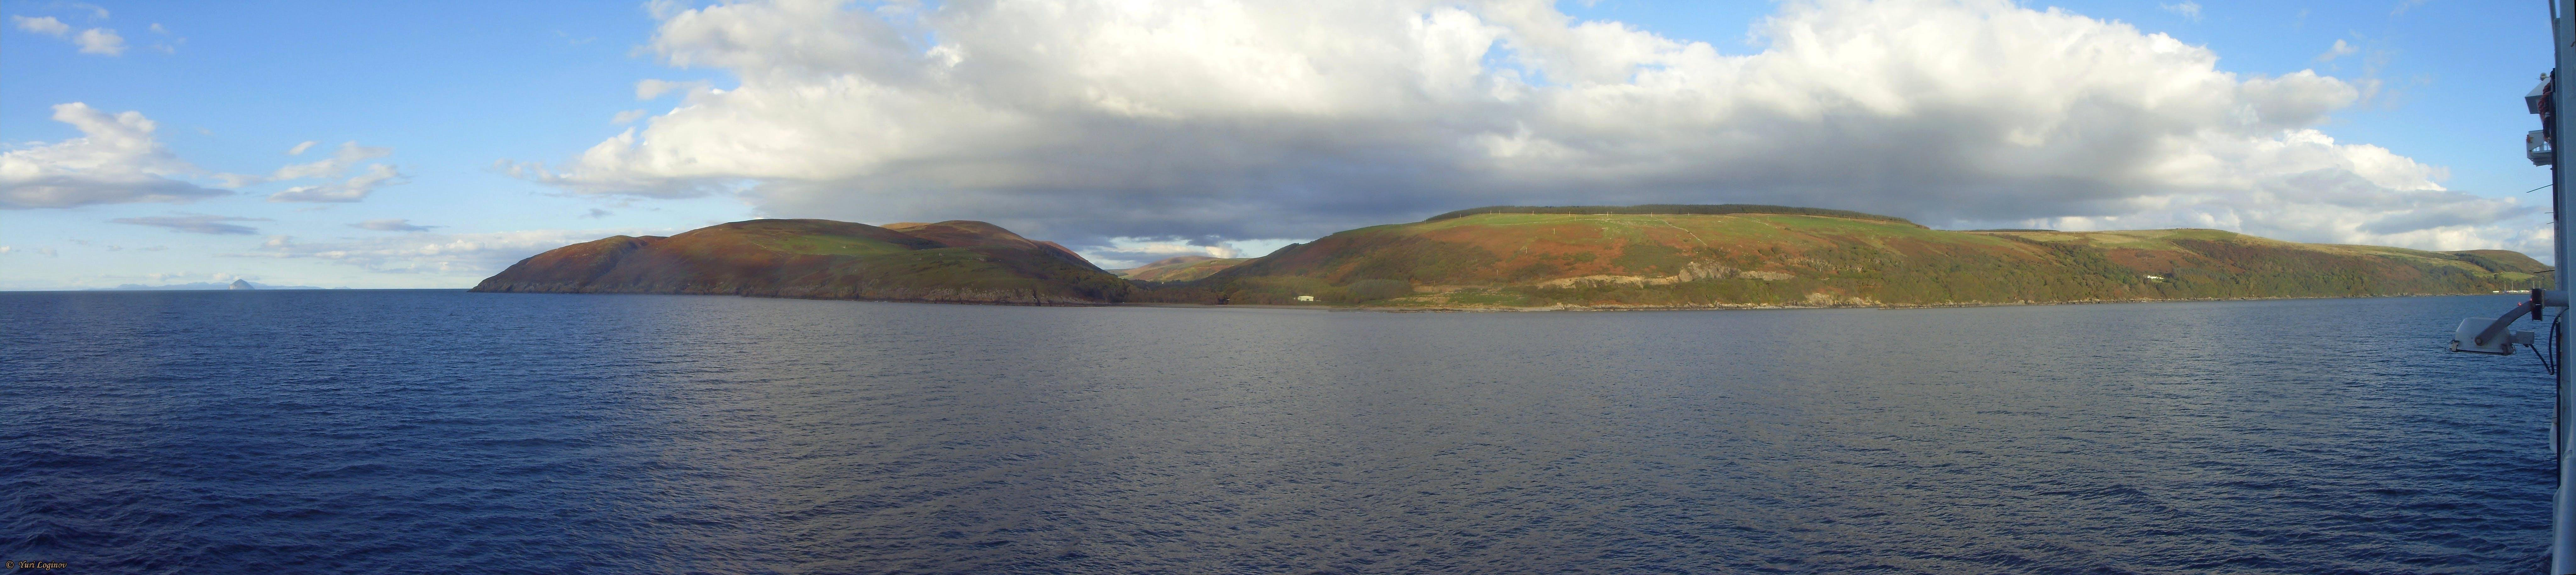 Free stock photo of scotland, united kingdom, Loch Ryan